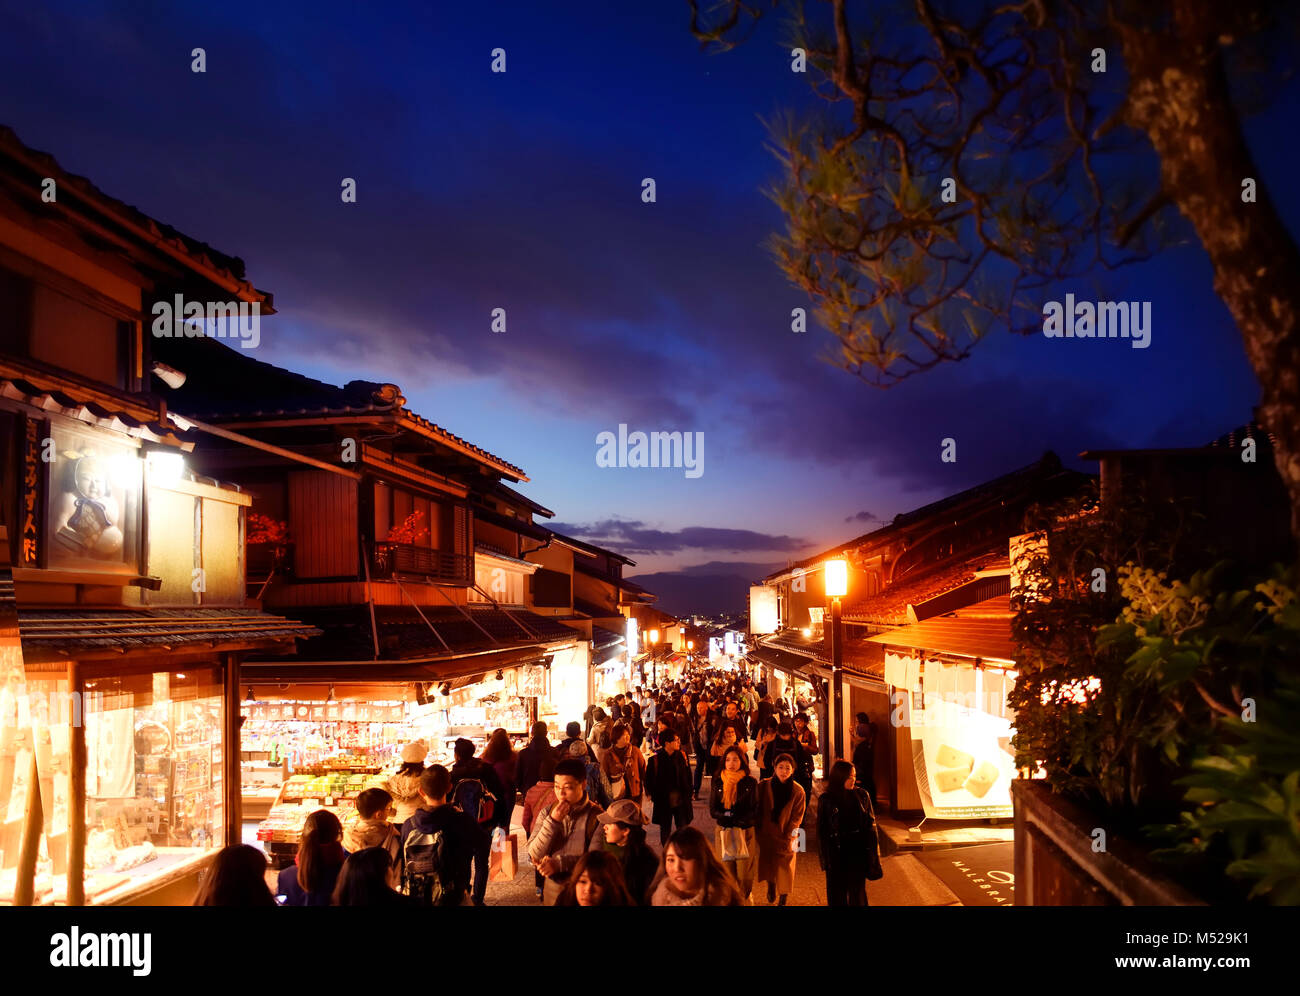 Matsubara dori street a Kyoto di notte piena di gente e luci luminose nei pressi di Kiyomizu-dera tempio. Higashiyama, Immagini Stock